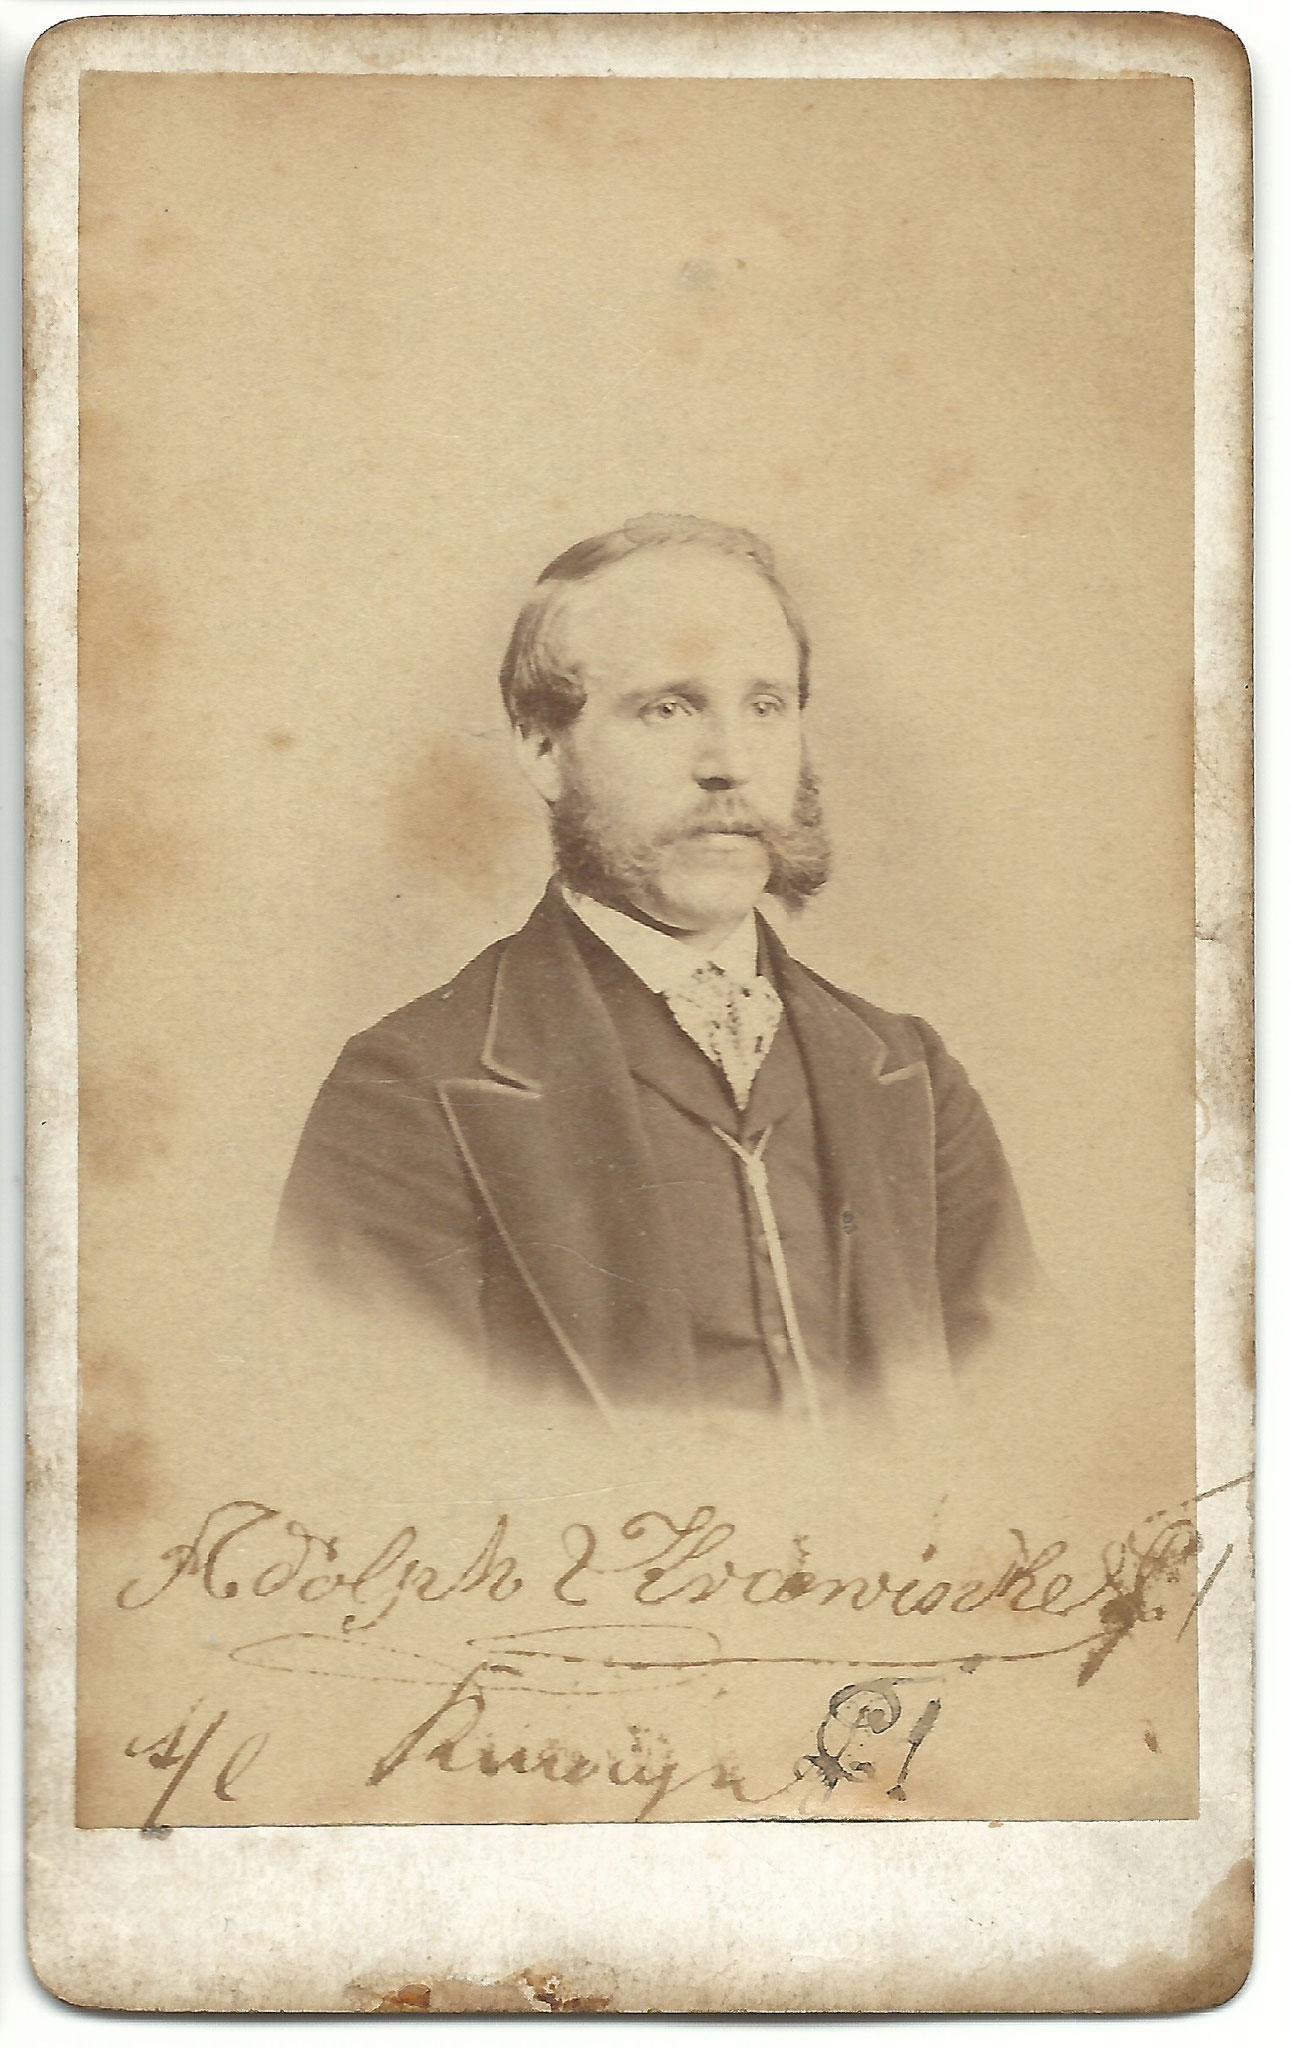 Adolph Krawinkel ca. 1865 (geb. 1.8.1840)